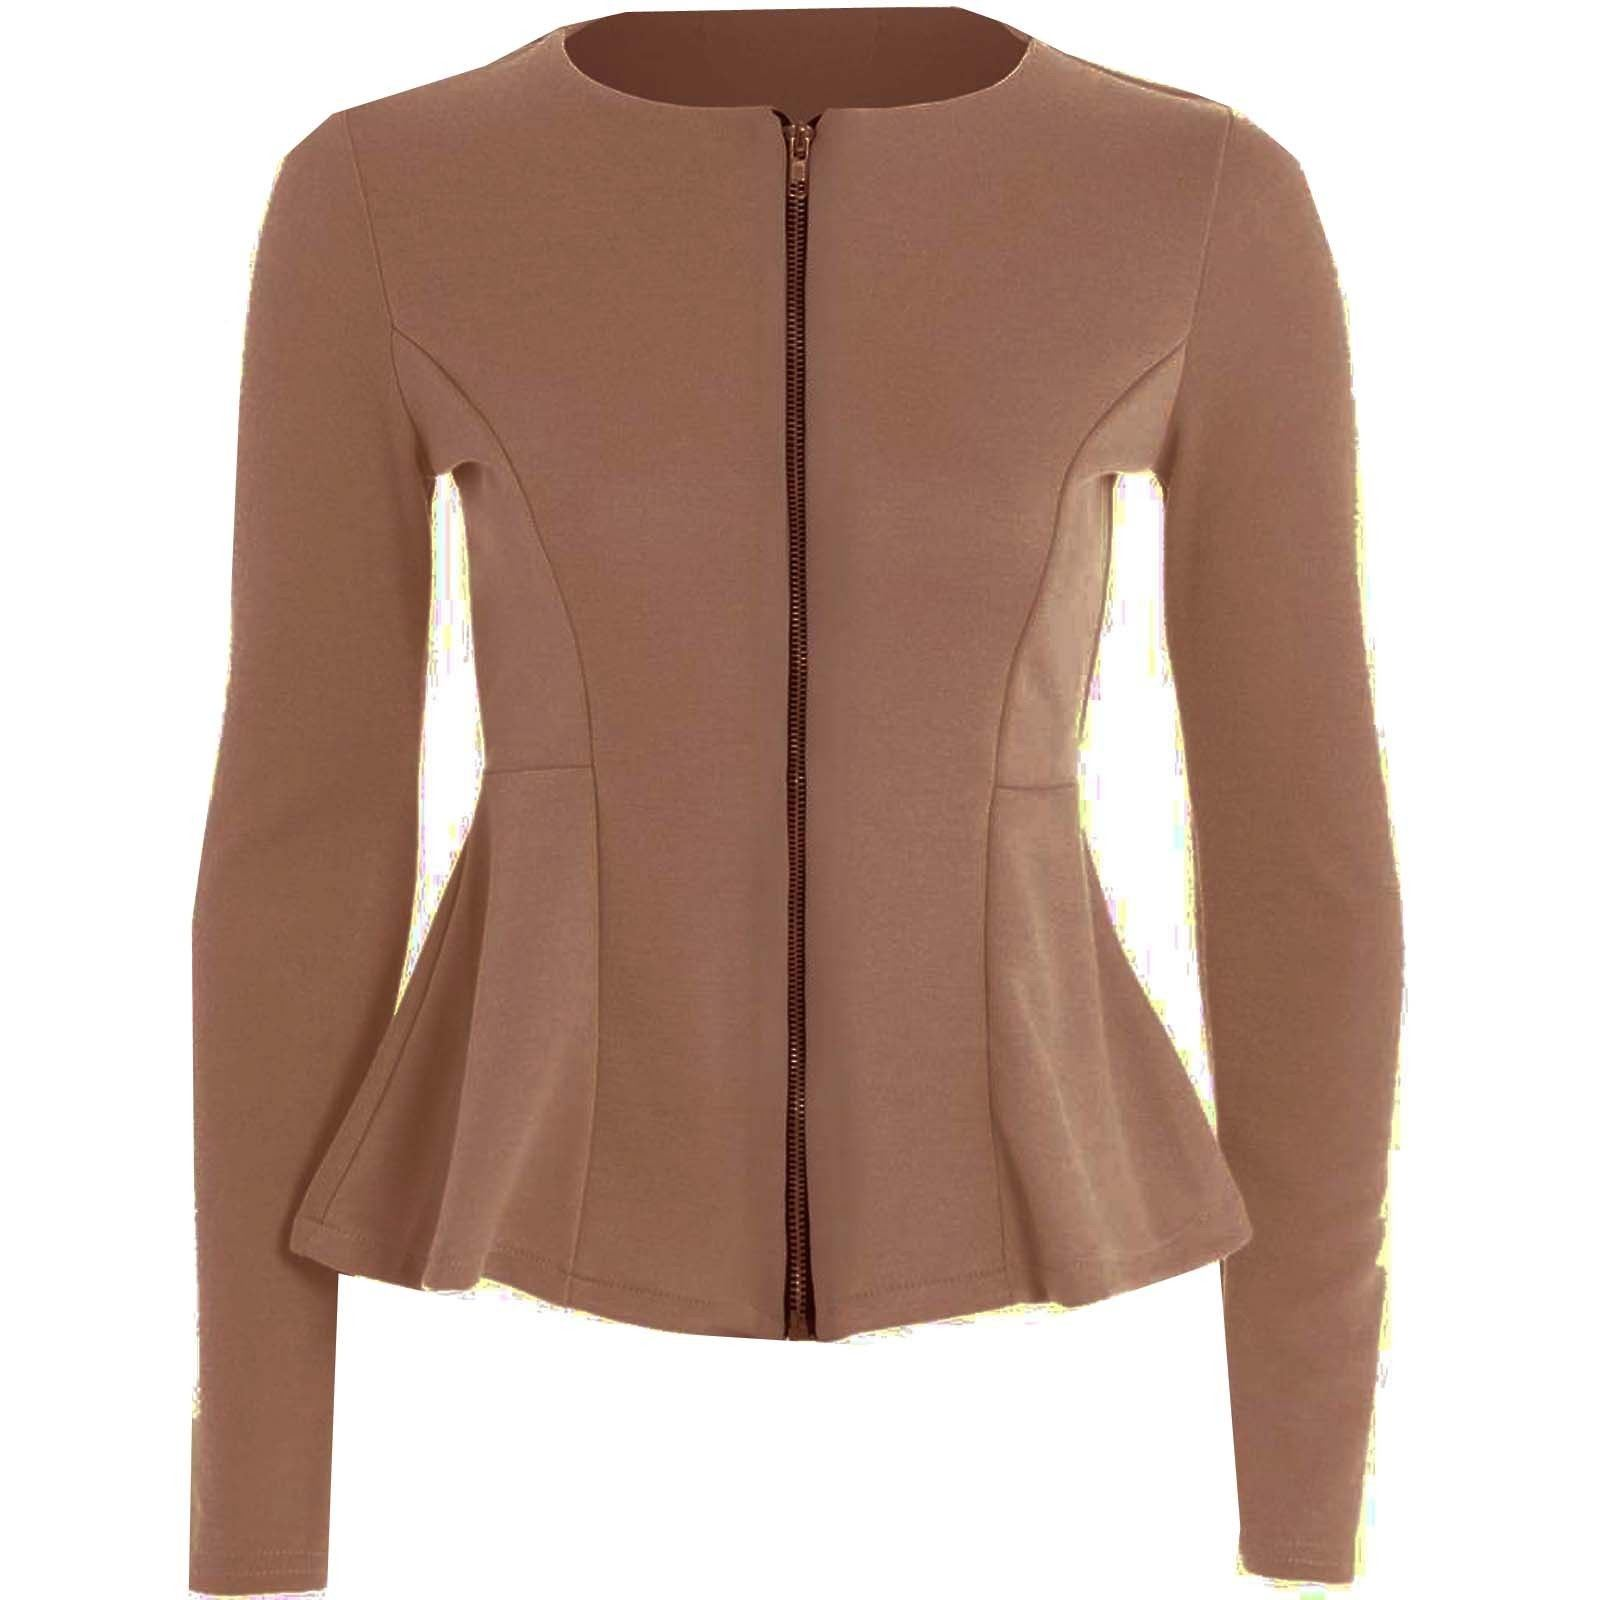 Office jackets for women